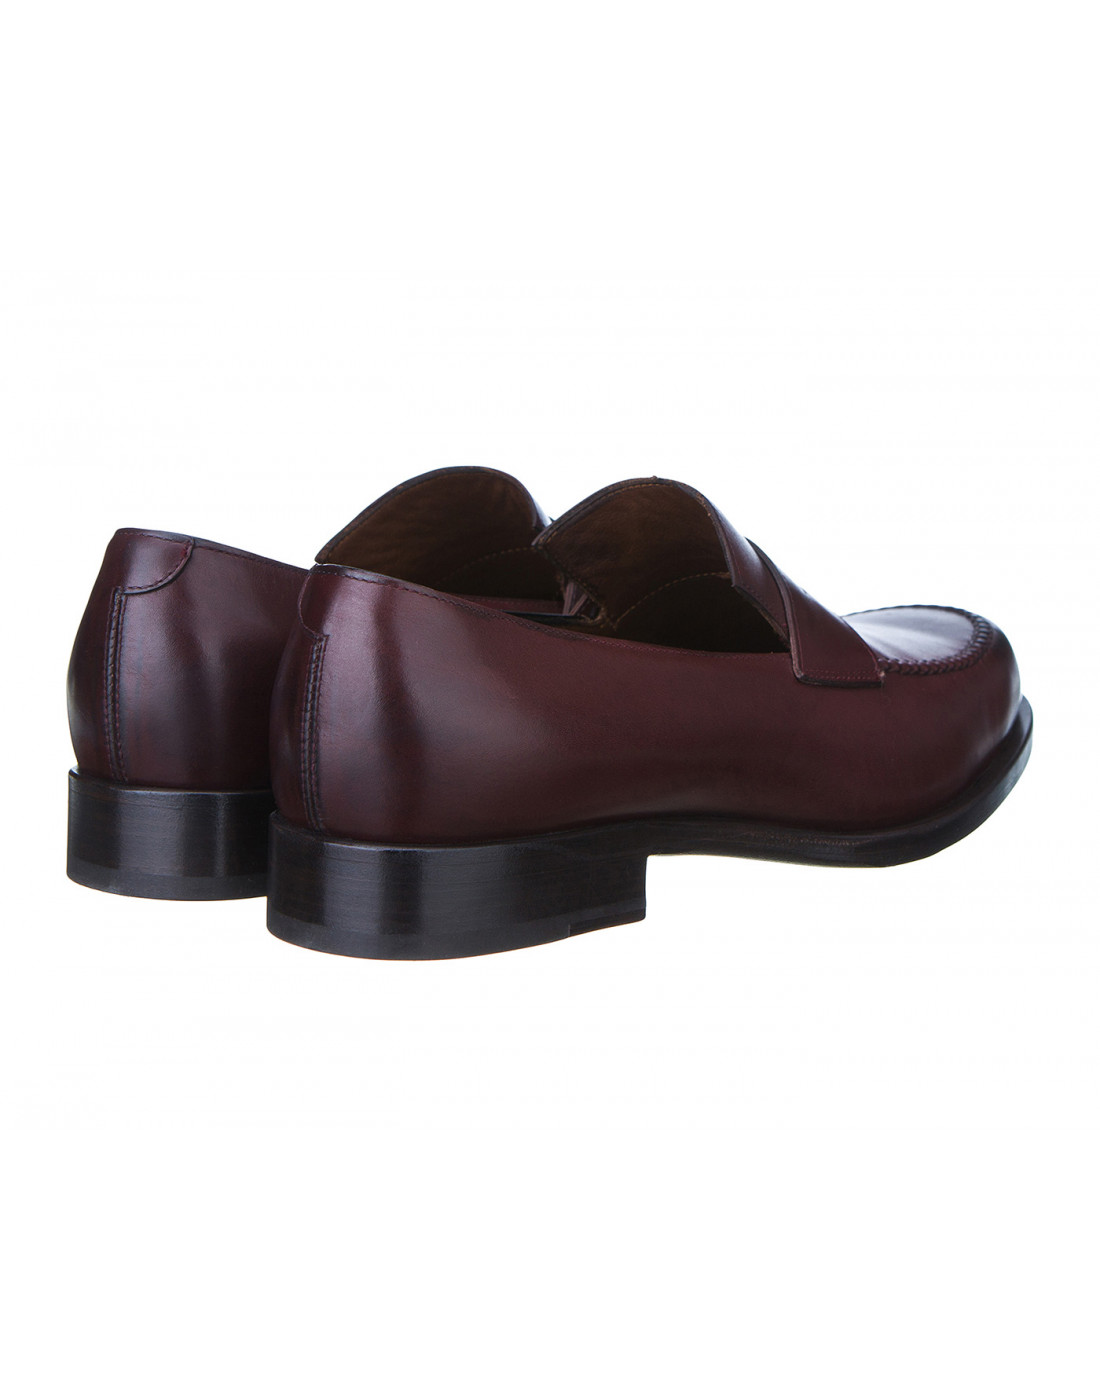 Туфли коричневые мужские Fratelli Rossetti S12597-3